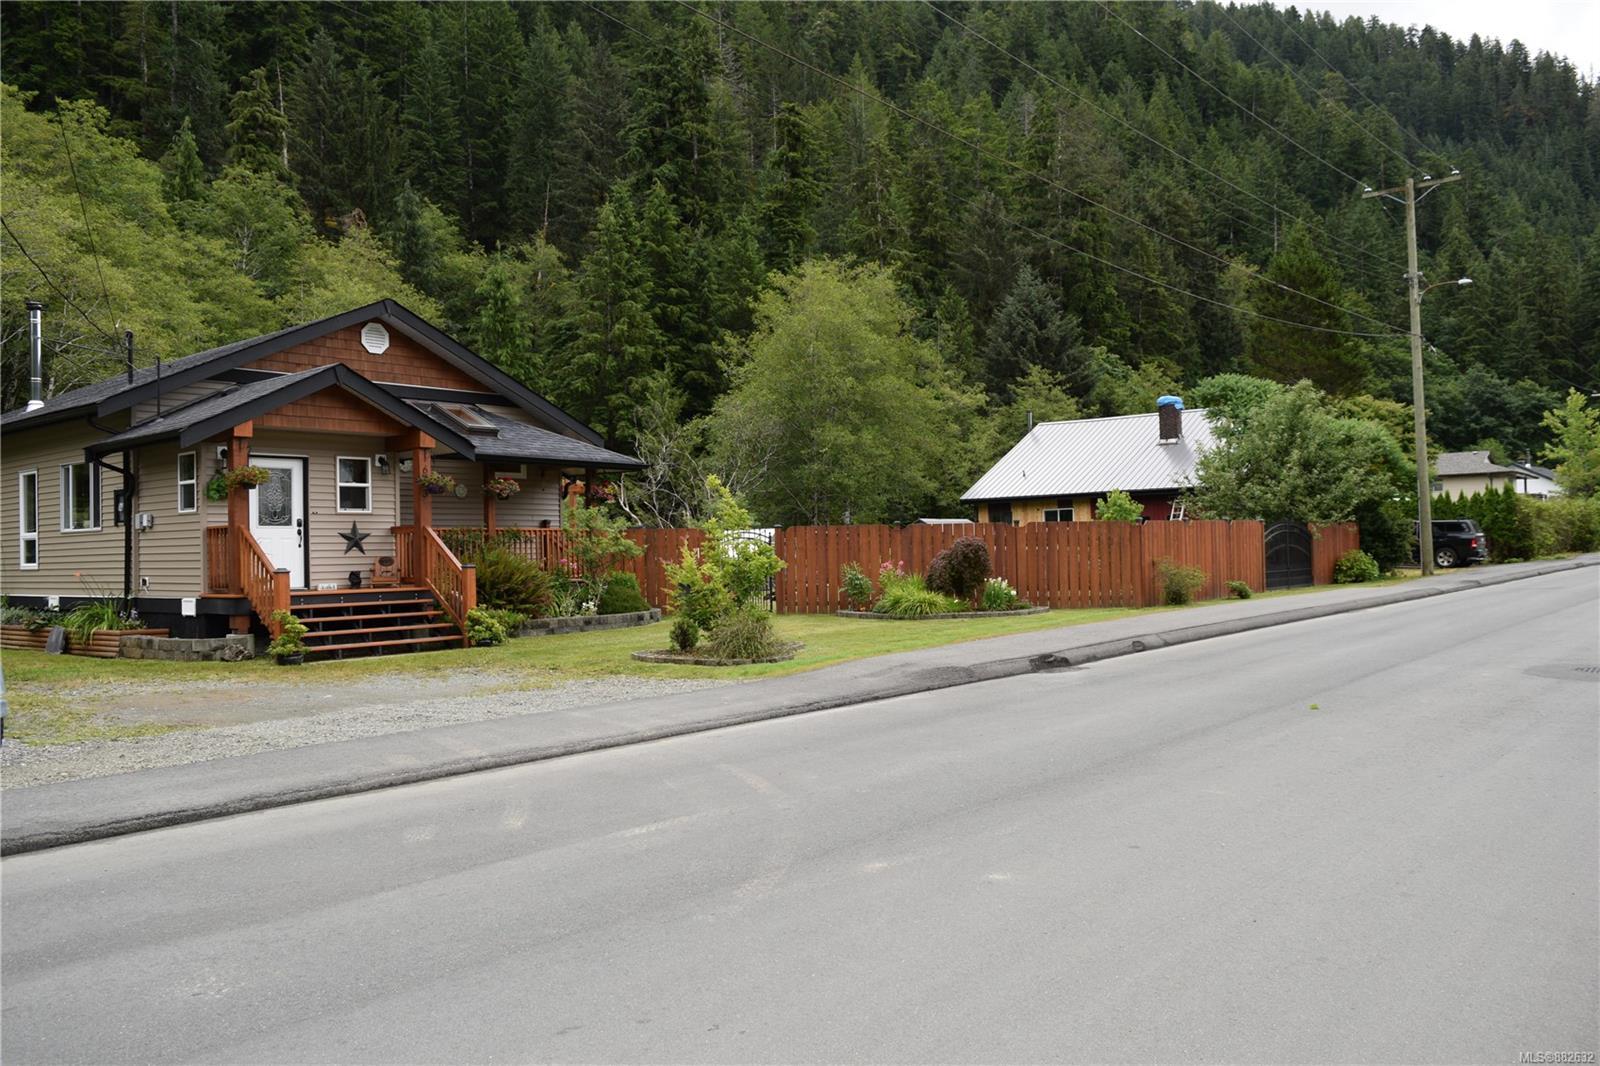 Photo 55 at 623 Alpine View Road, North Island